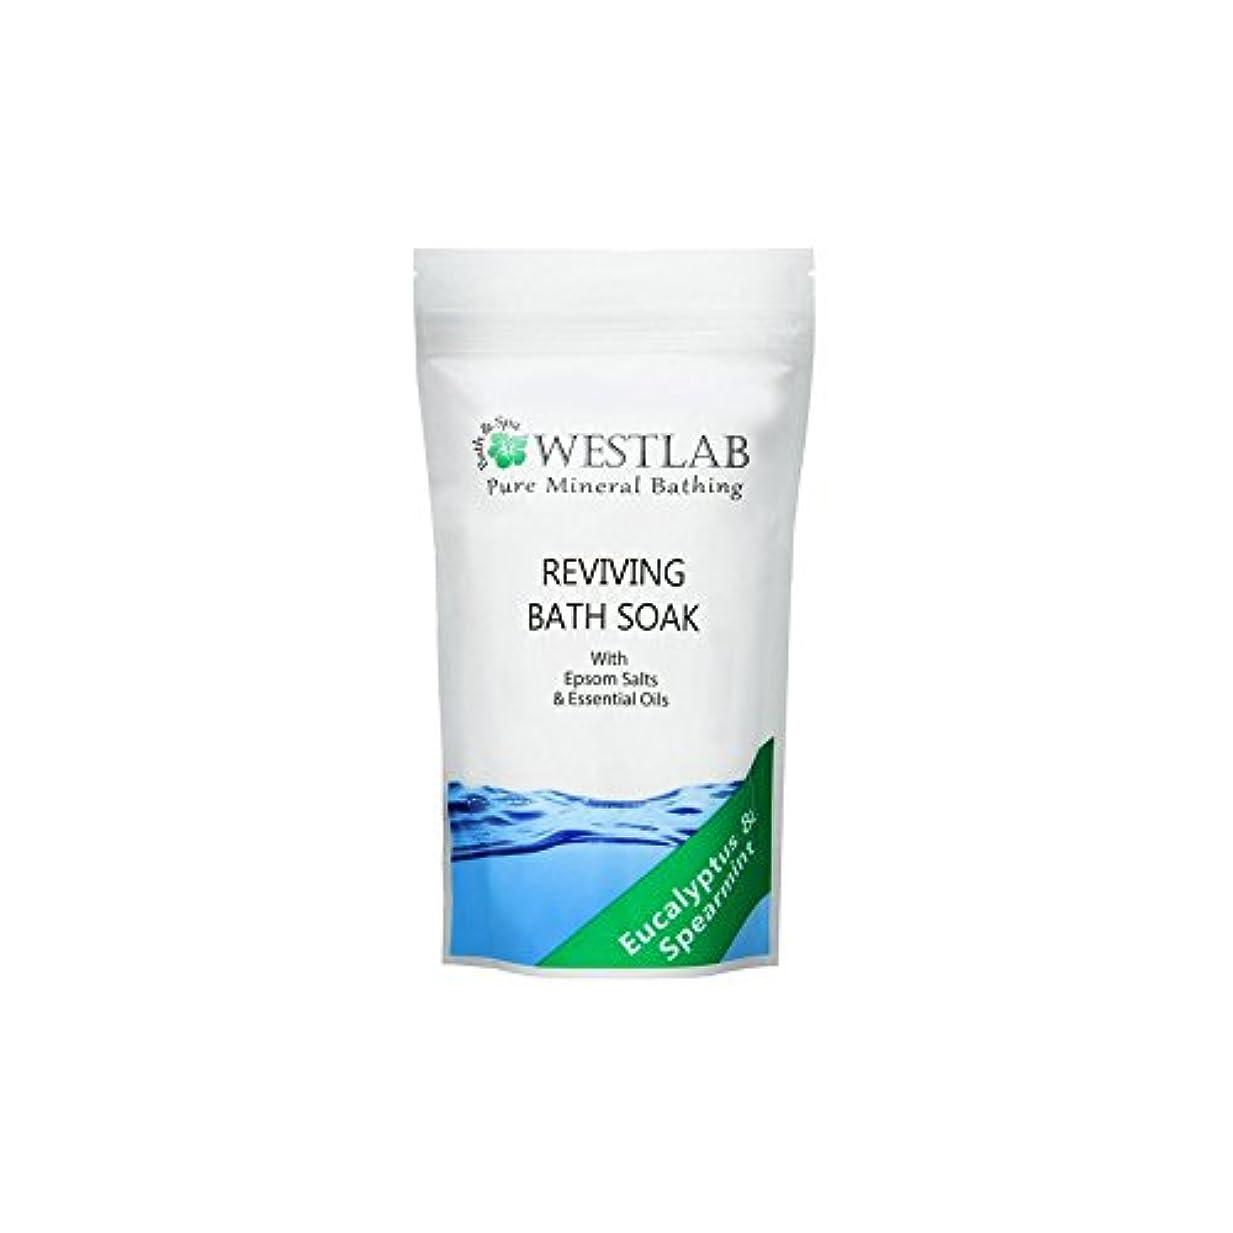 Westlab Revive Epsom Salt Bath Soak (500g) (Pack of 6) - (500グラム)をソークエプソム塩浴を復活させます x6 [並行輸入品]